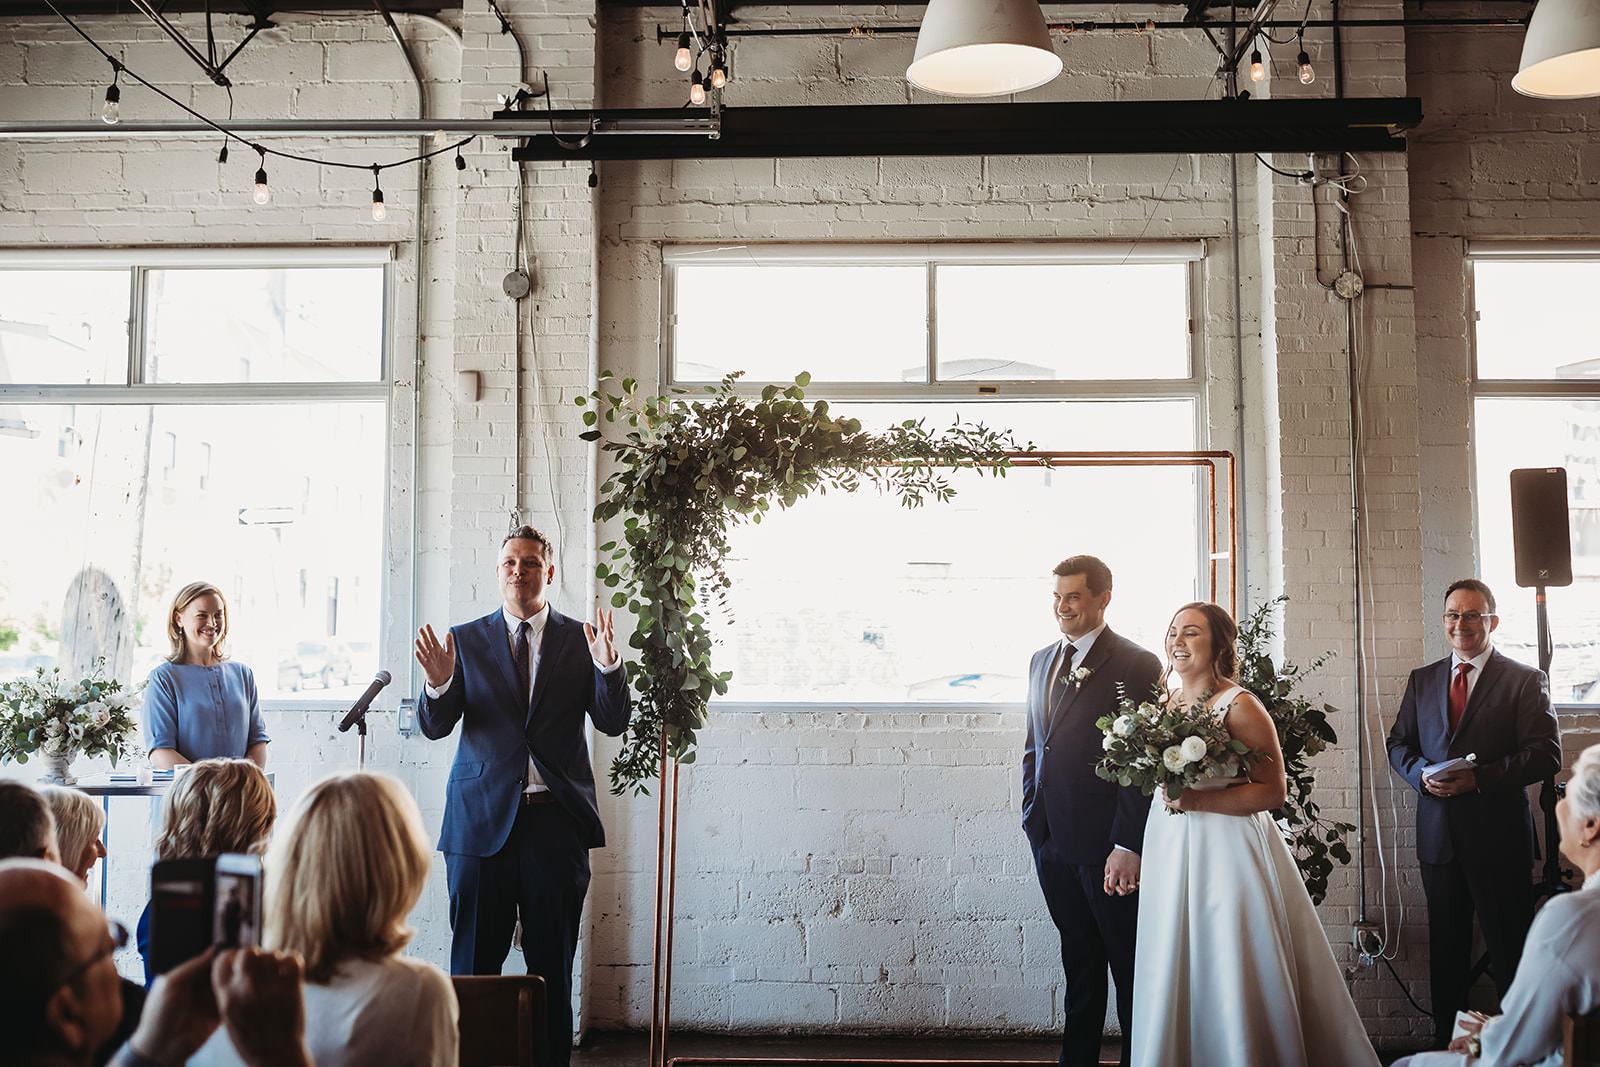 propeller coffee wedding, propeller coffee co., coffee shop wedding